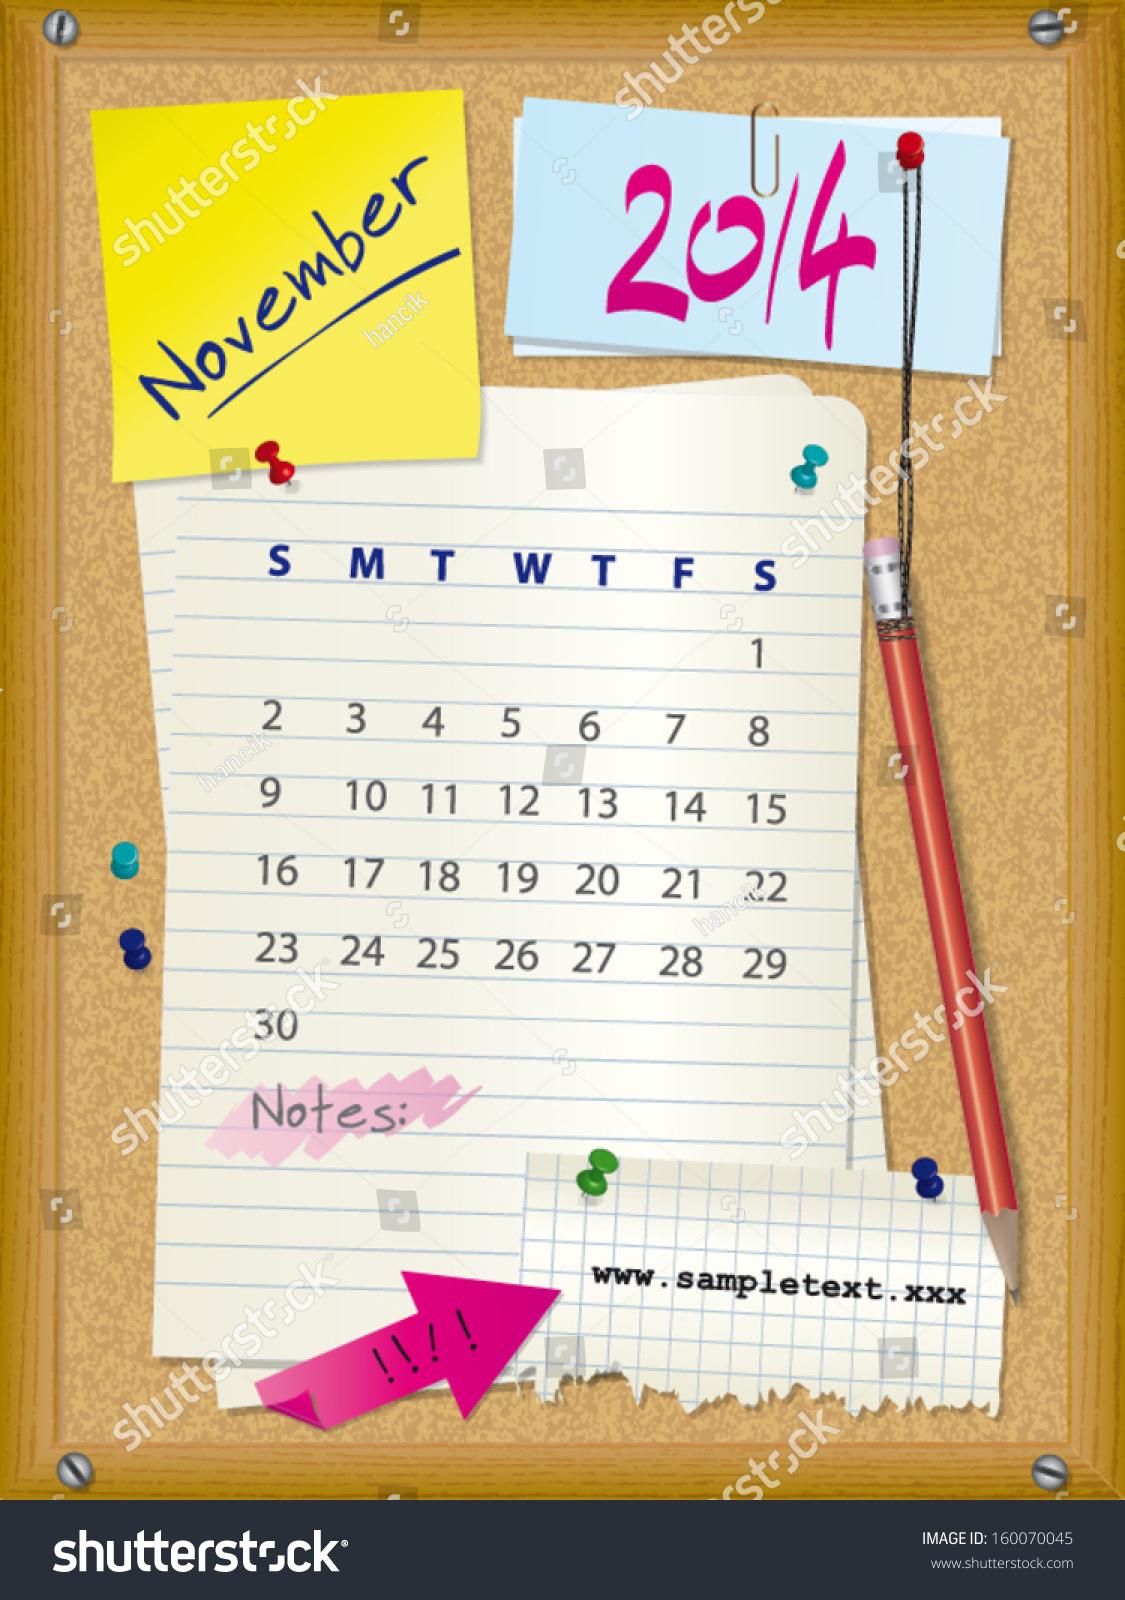 Calendar Illustration Board : Calendar month november cork board with notes